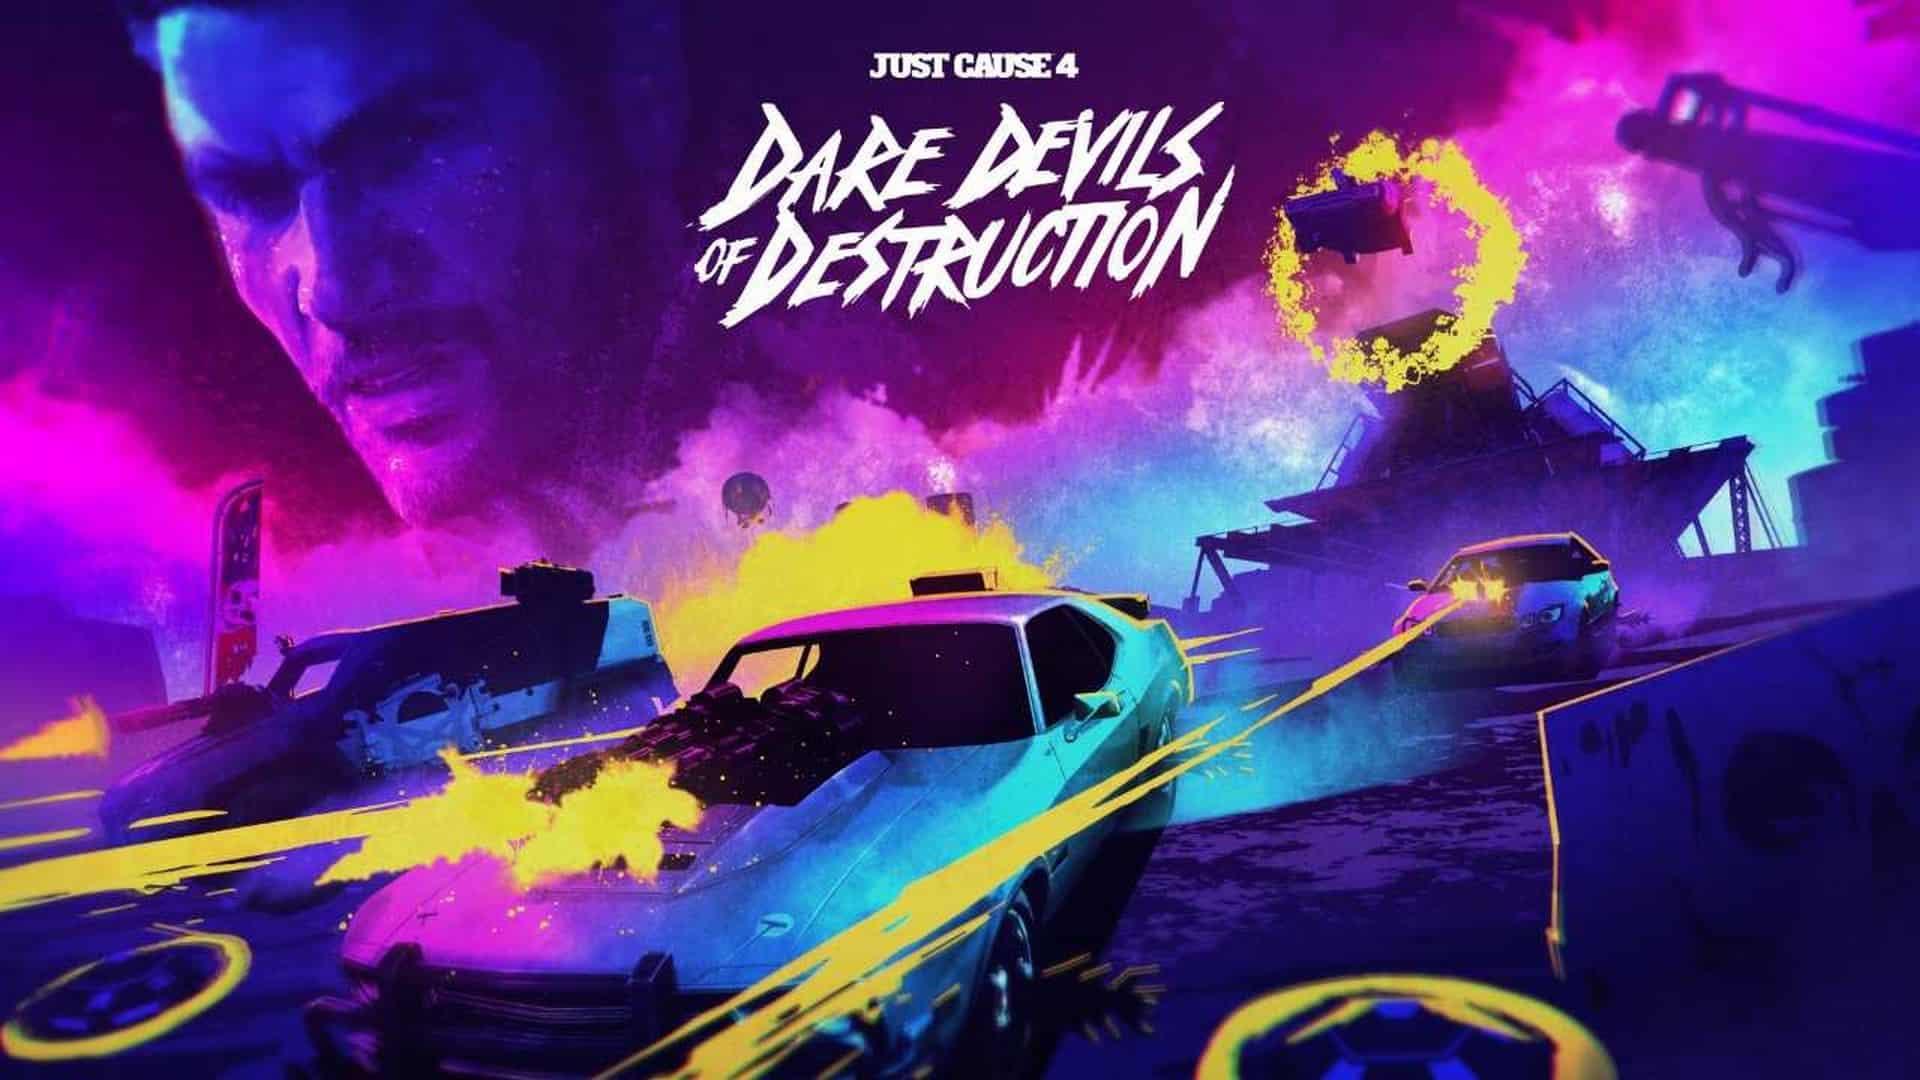 TRAILER: Just Cause 4: Dare Devils Of Destruction Announced